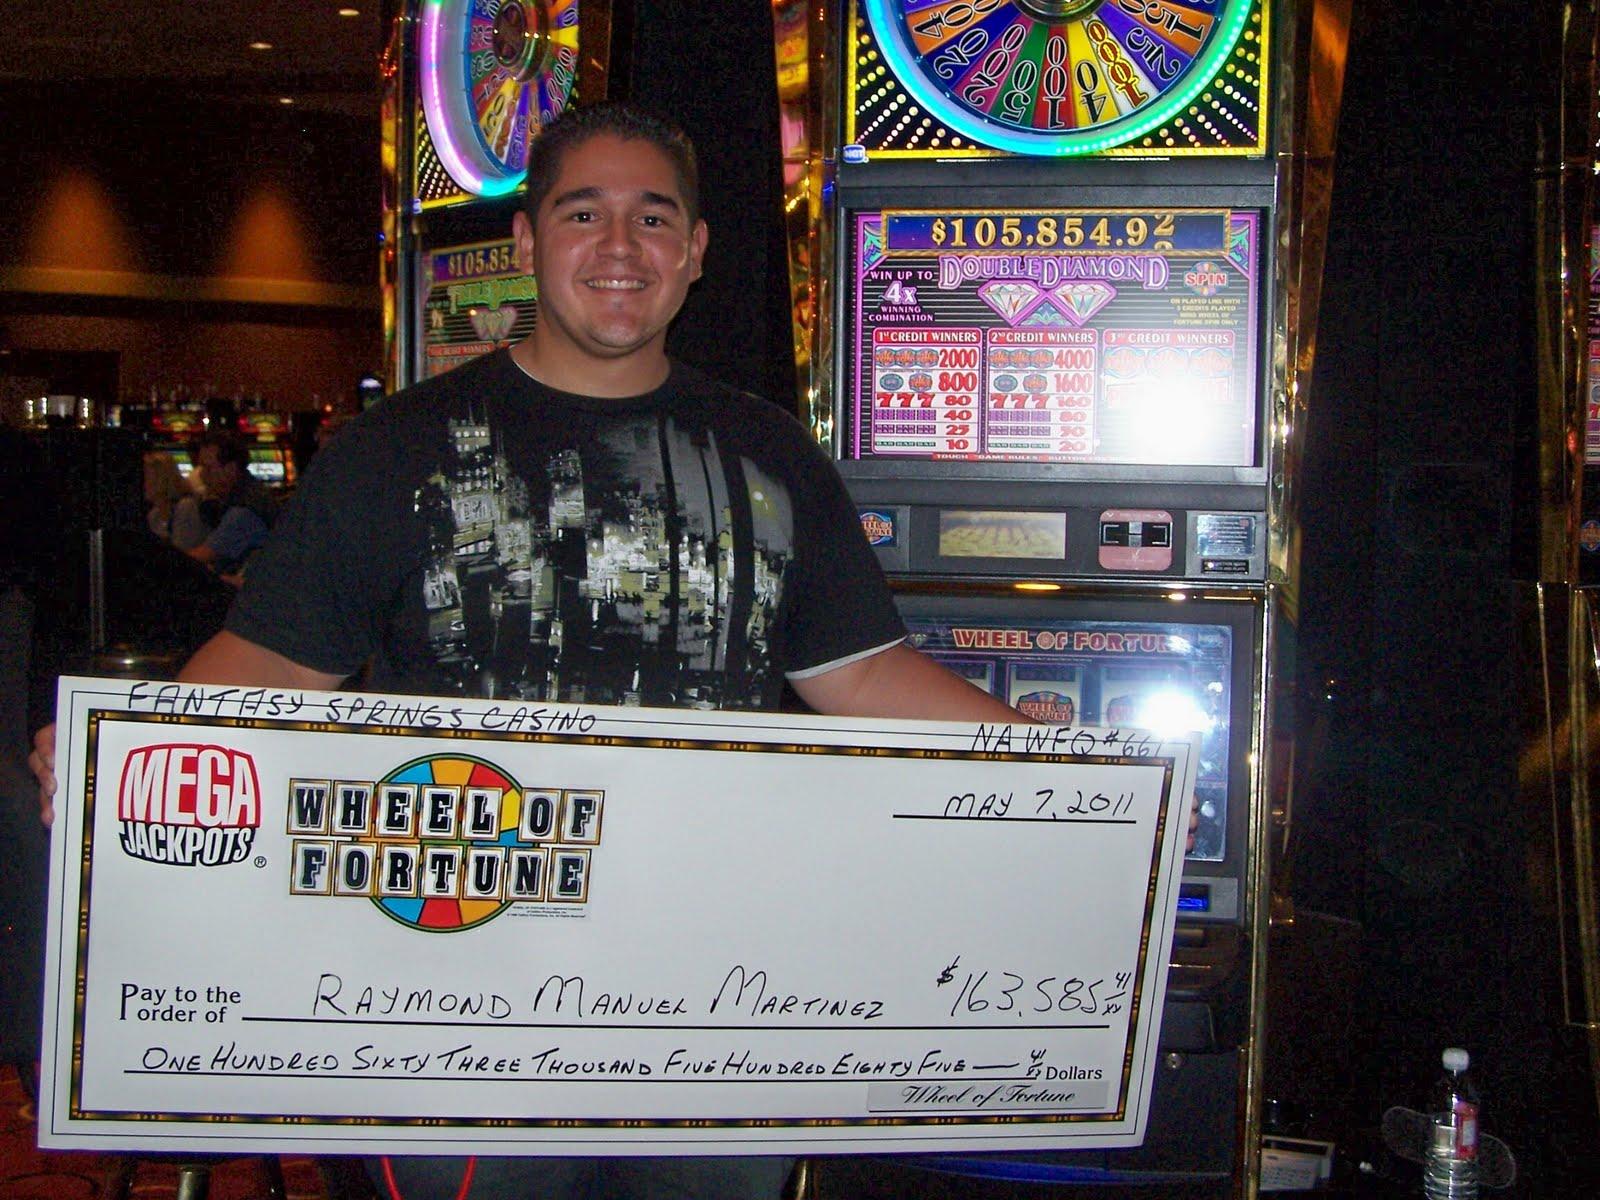 Big casino slot machine wins